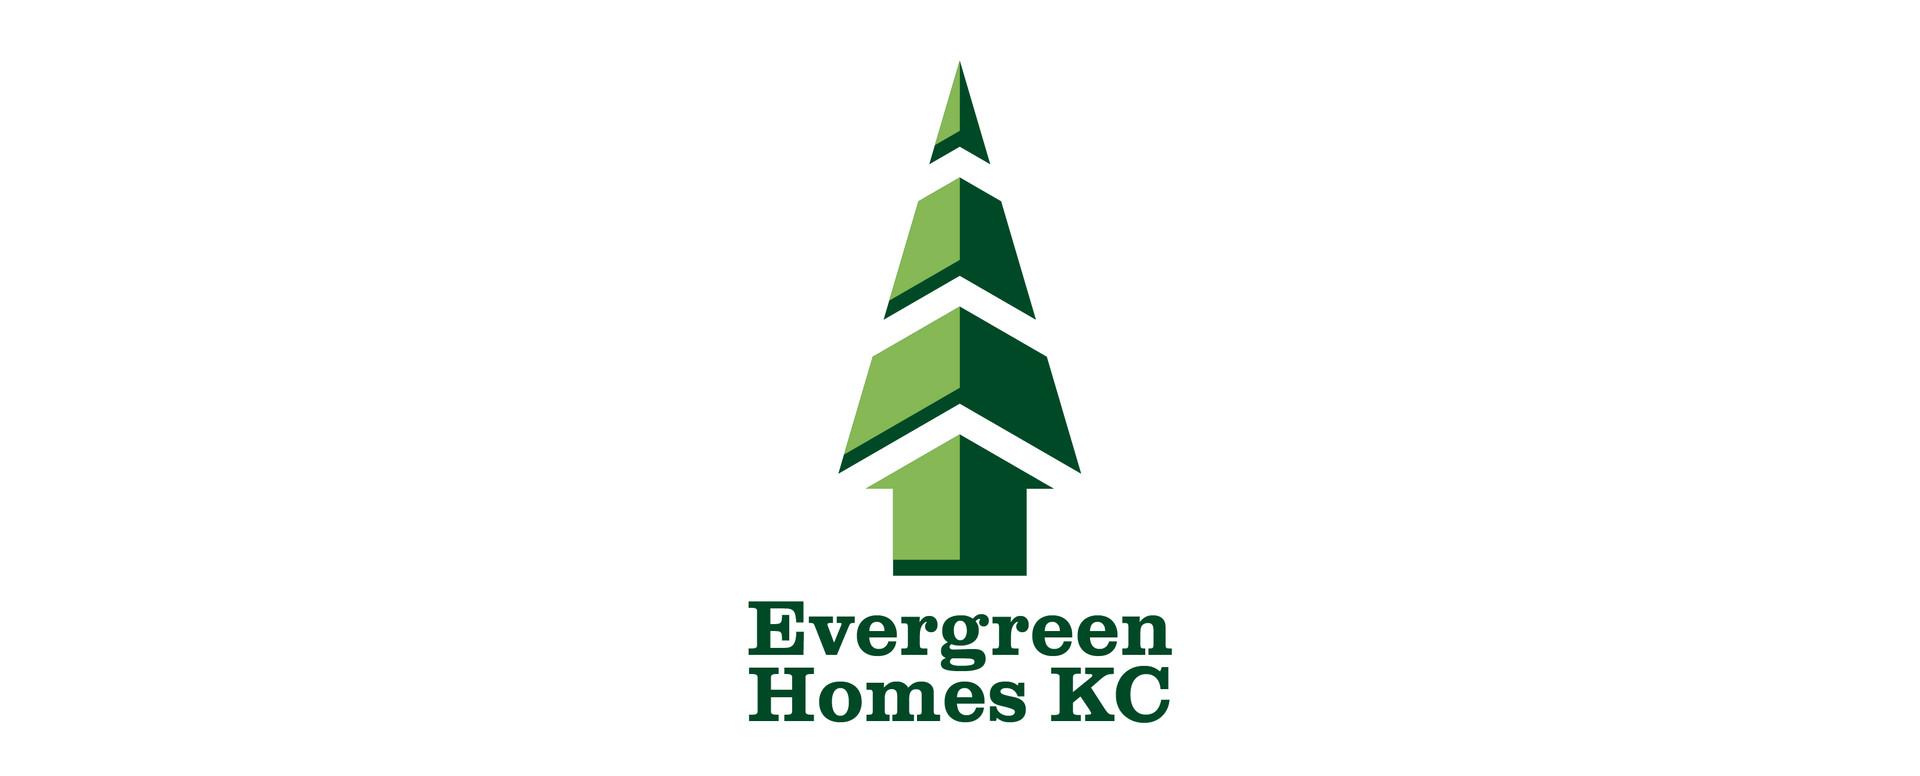 Evergreen Homes KC